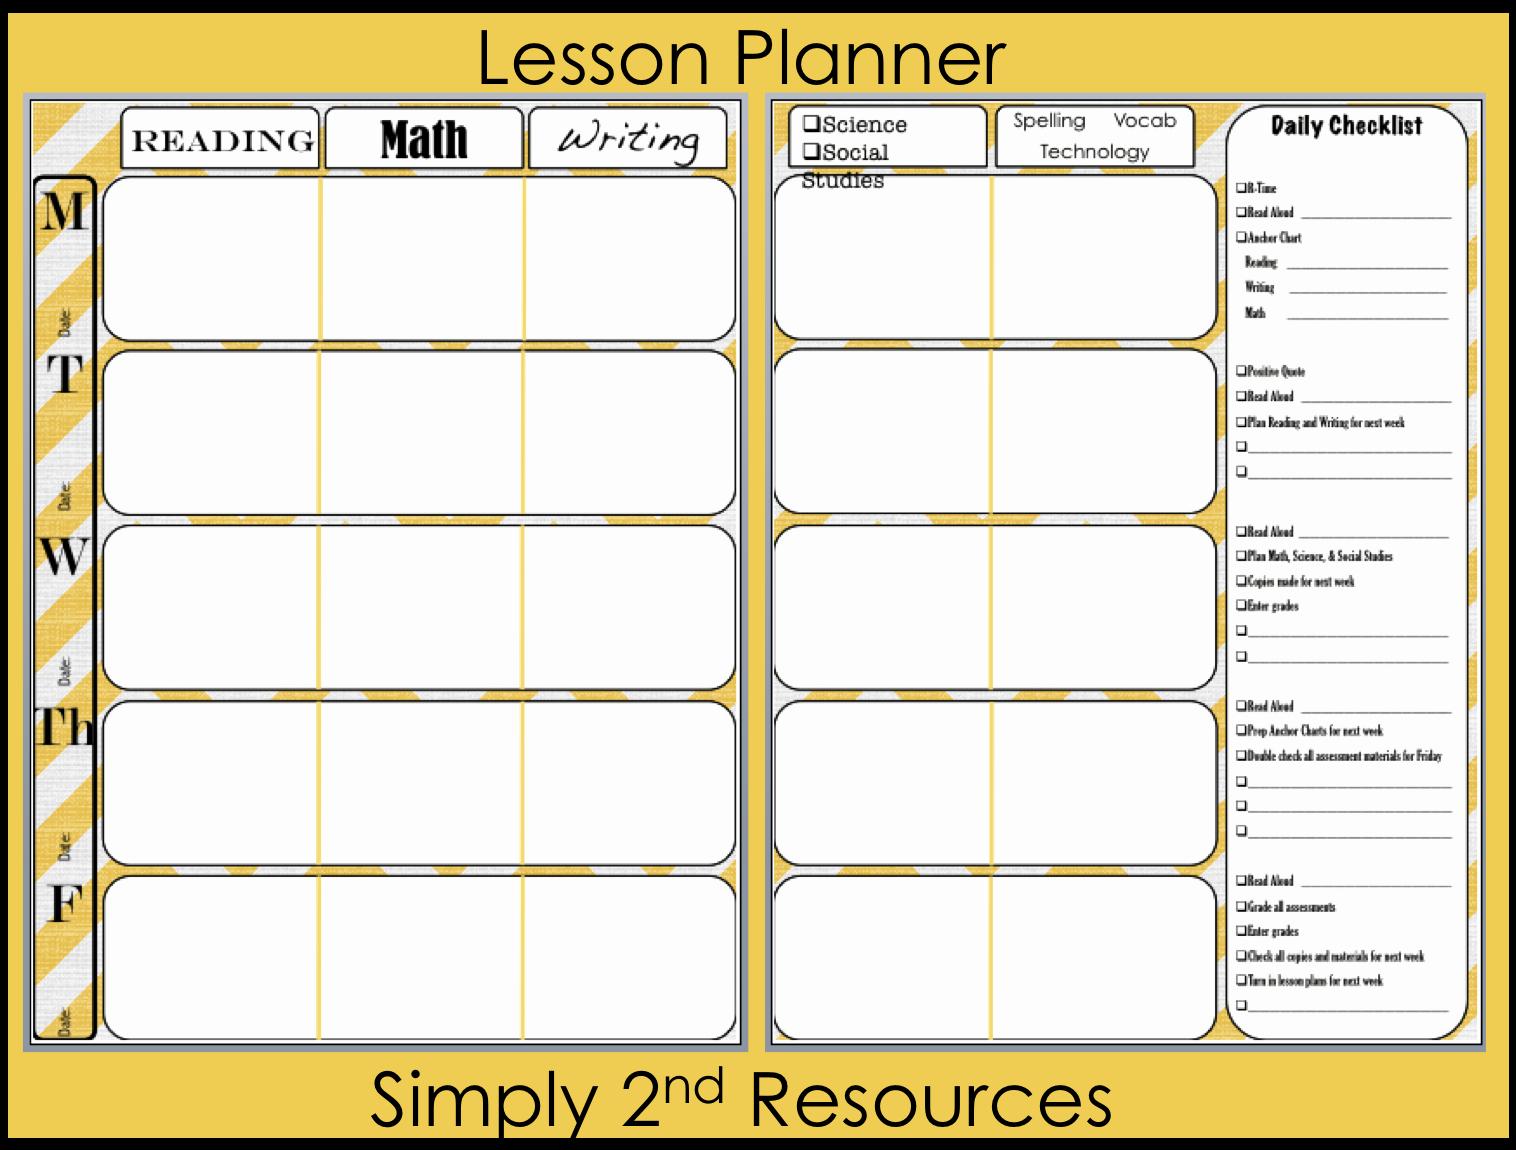 Teacher Lesson Plan Book Template Elegant Lesson Plan Book Template Printable